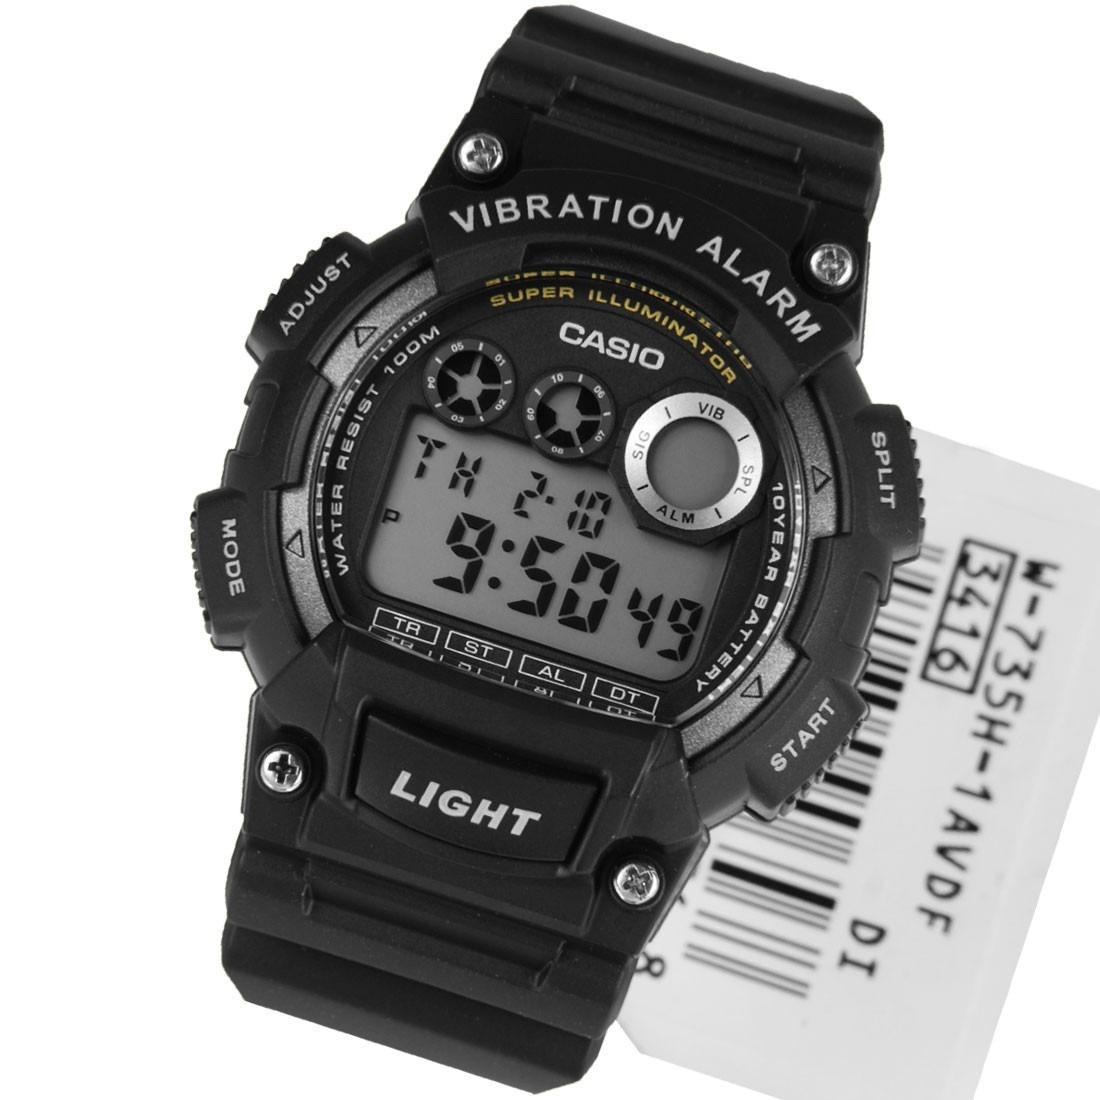 62dcb1069571 reloj deportivo juvenil casio w-735h negro vibration. Cargando zoom... reloj  deportivo casio. Cargando zoom.